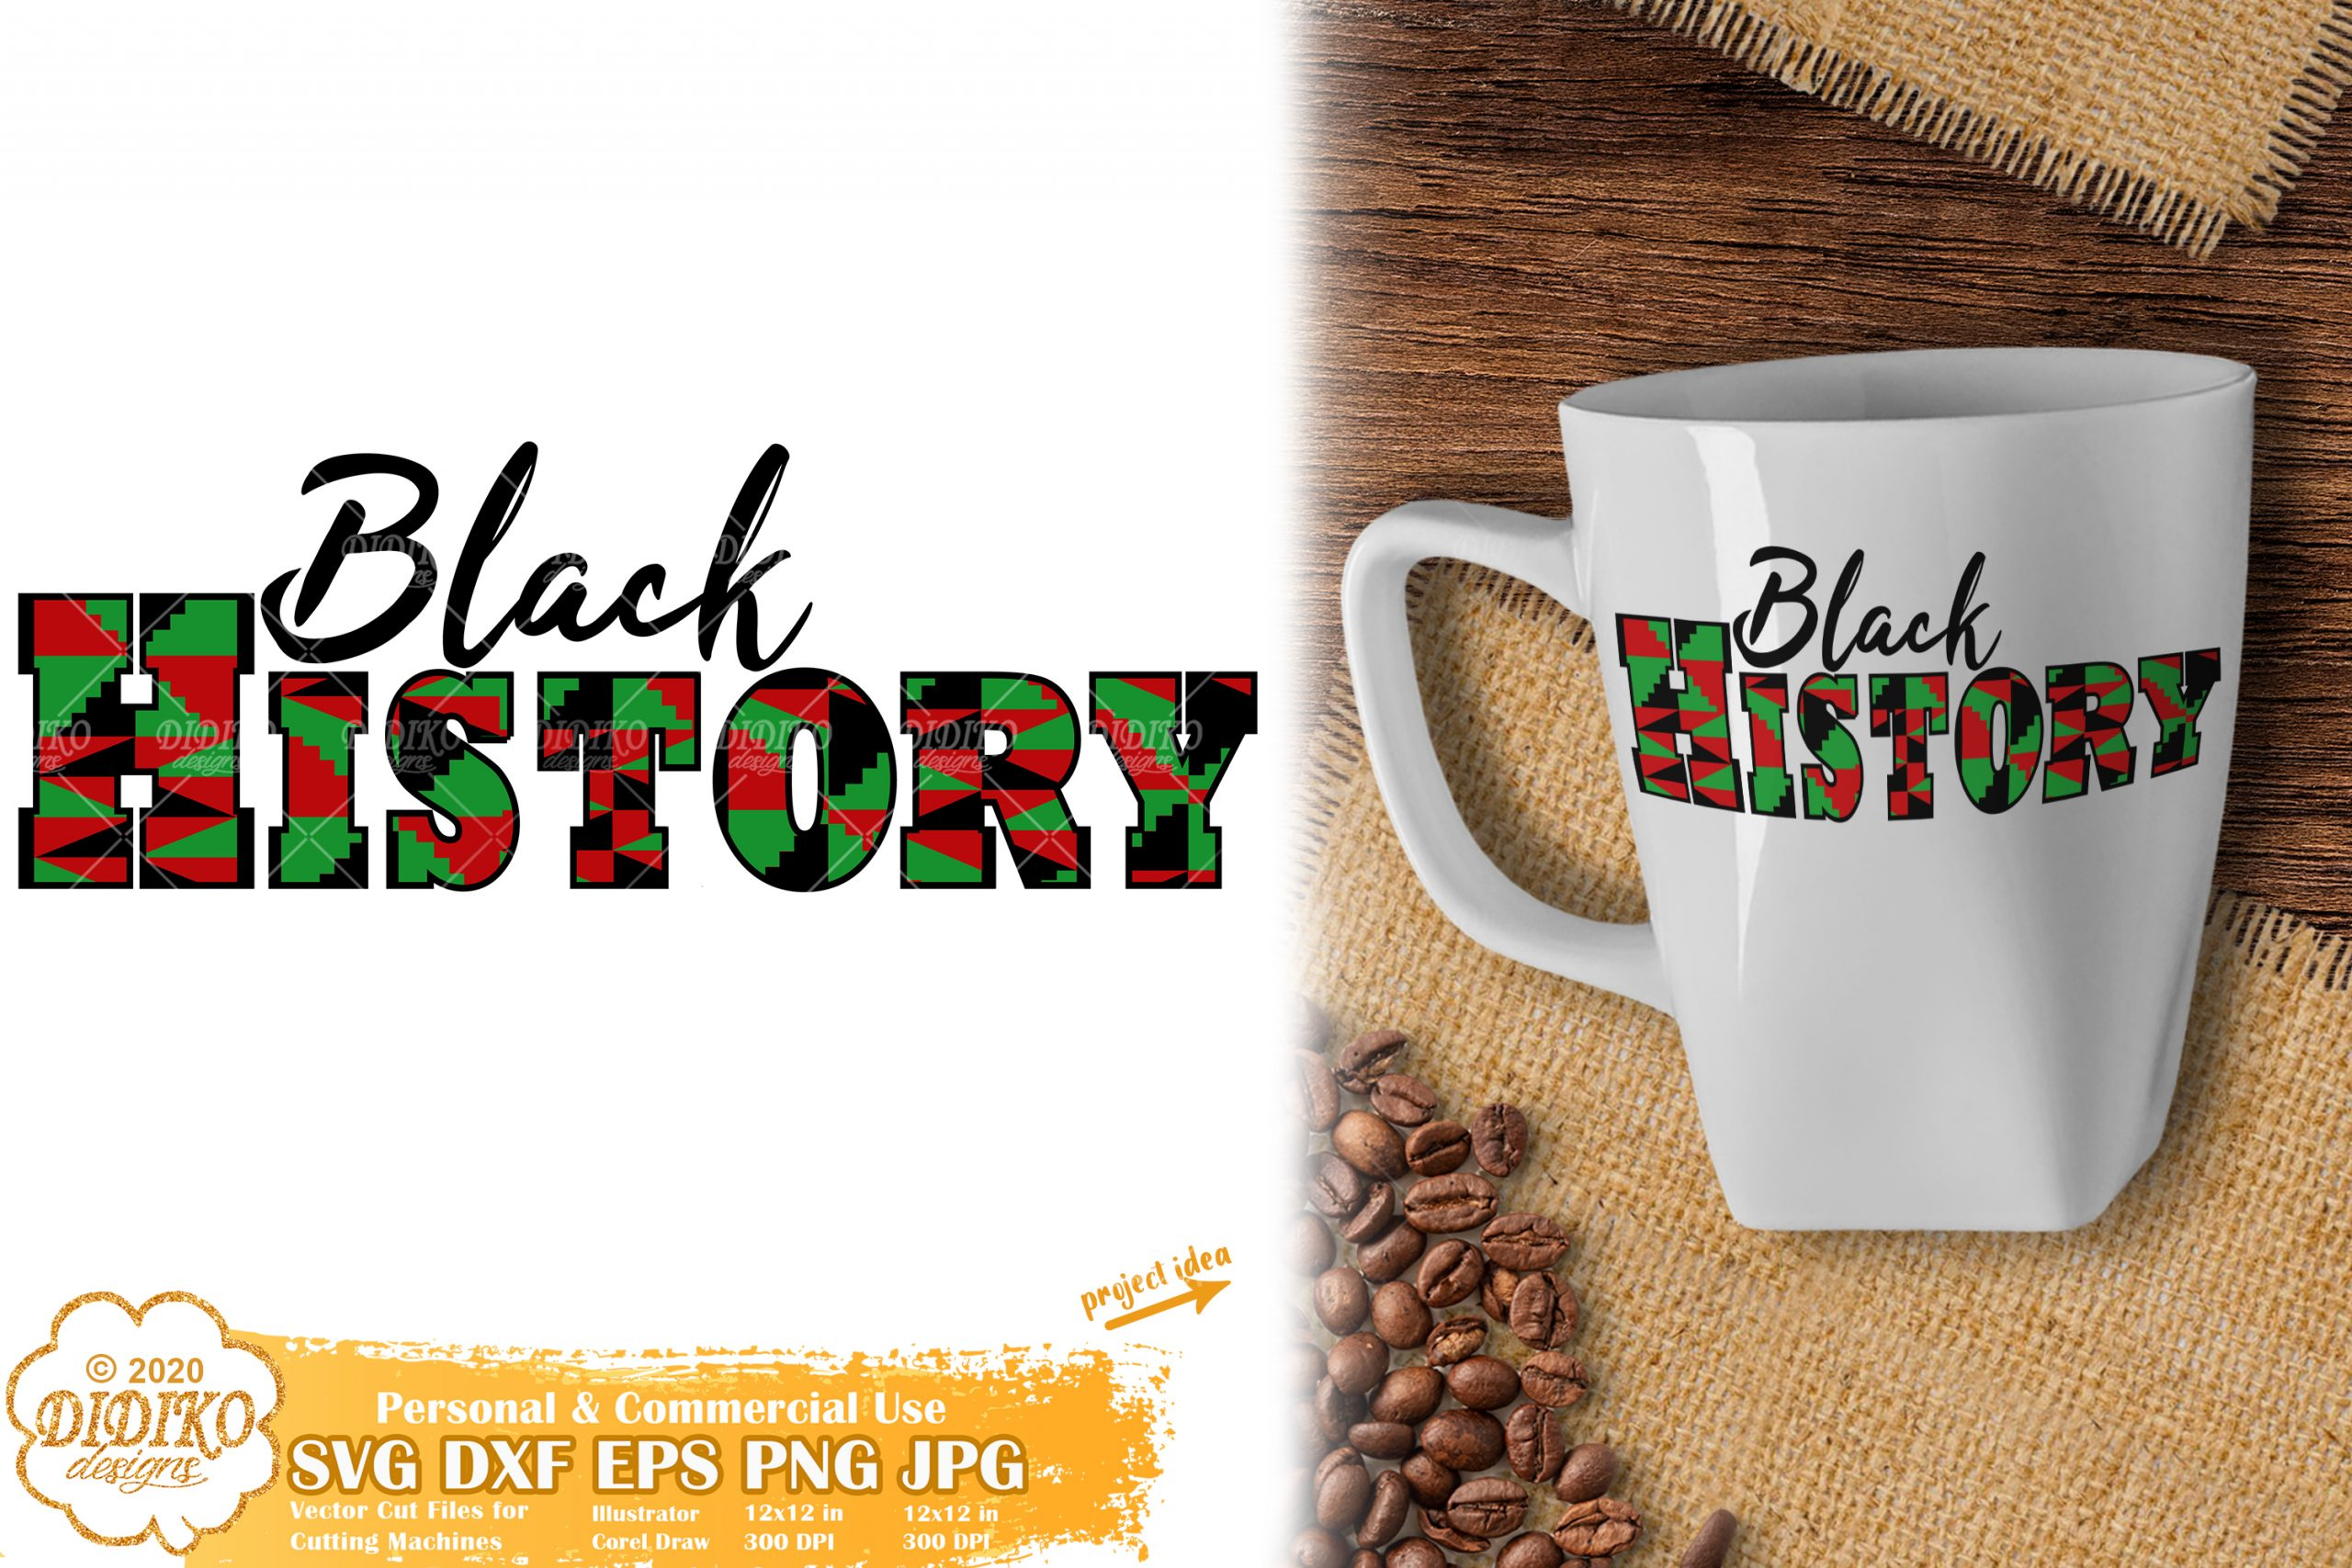 Black History Month SVG